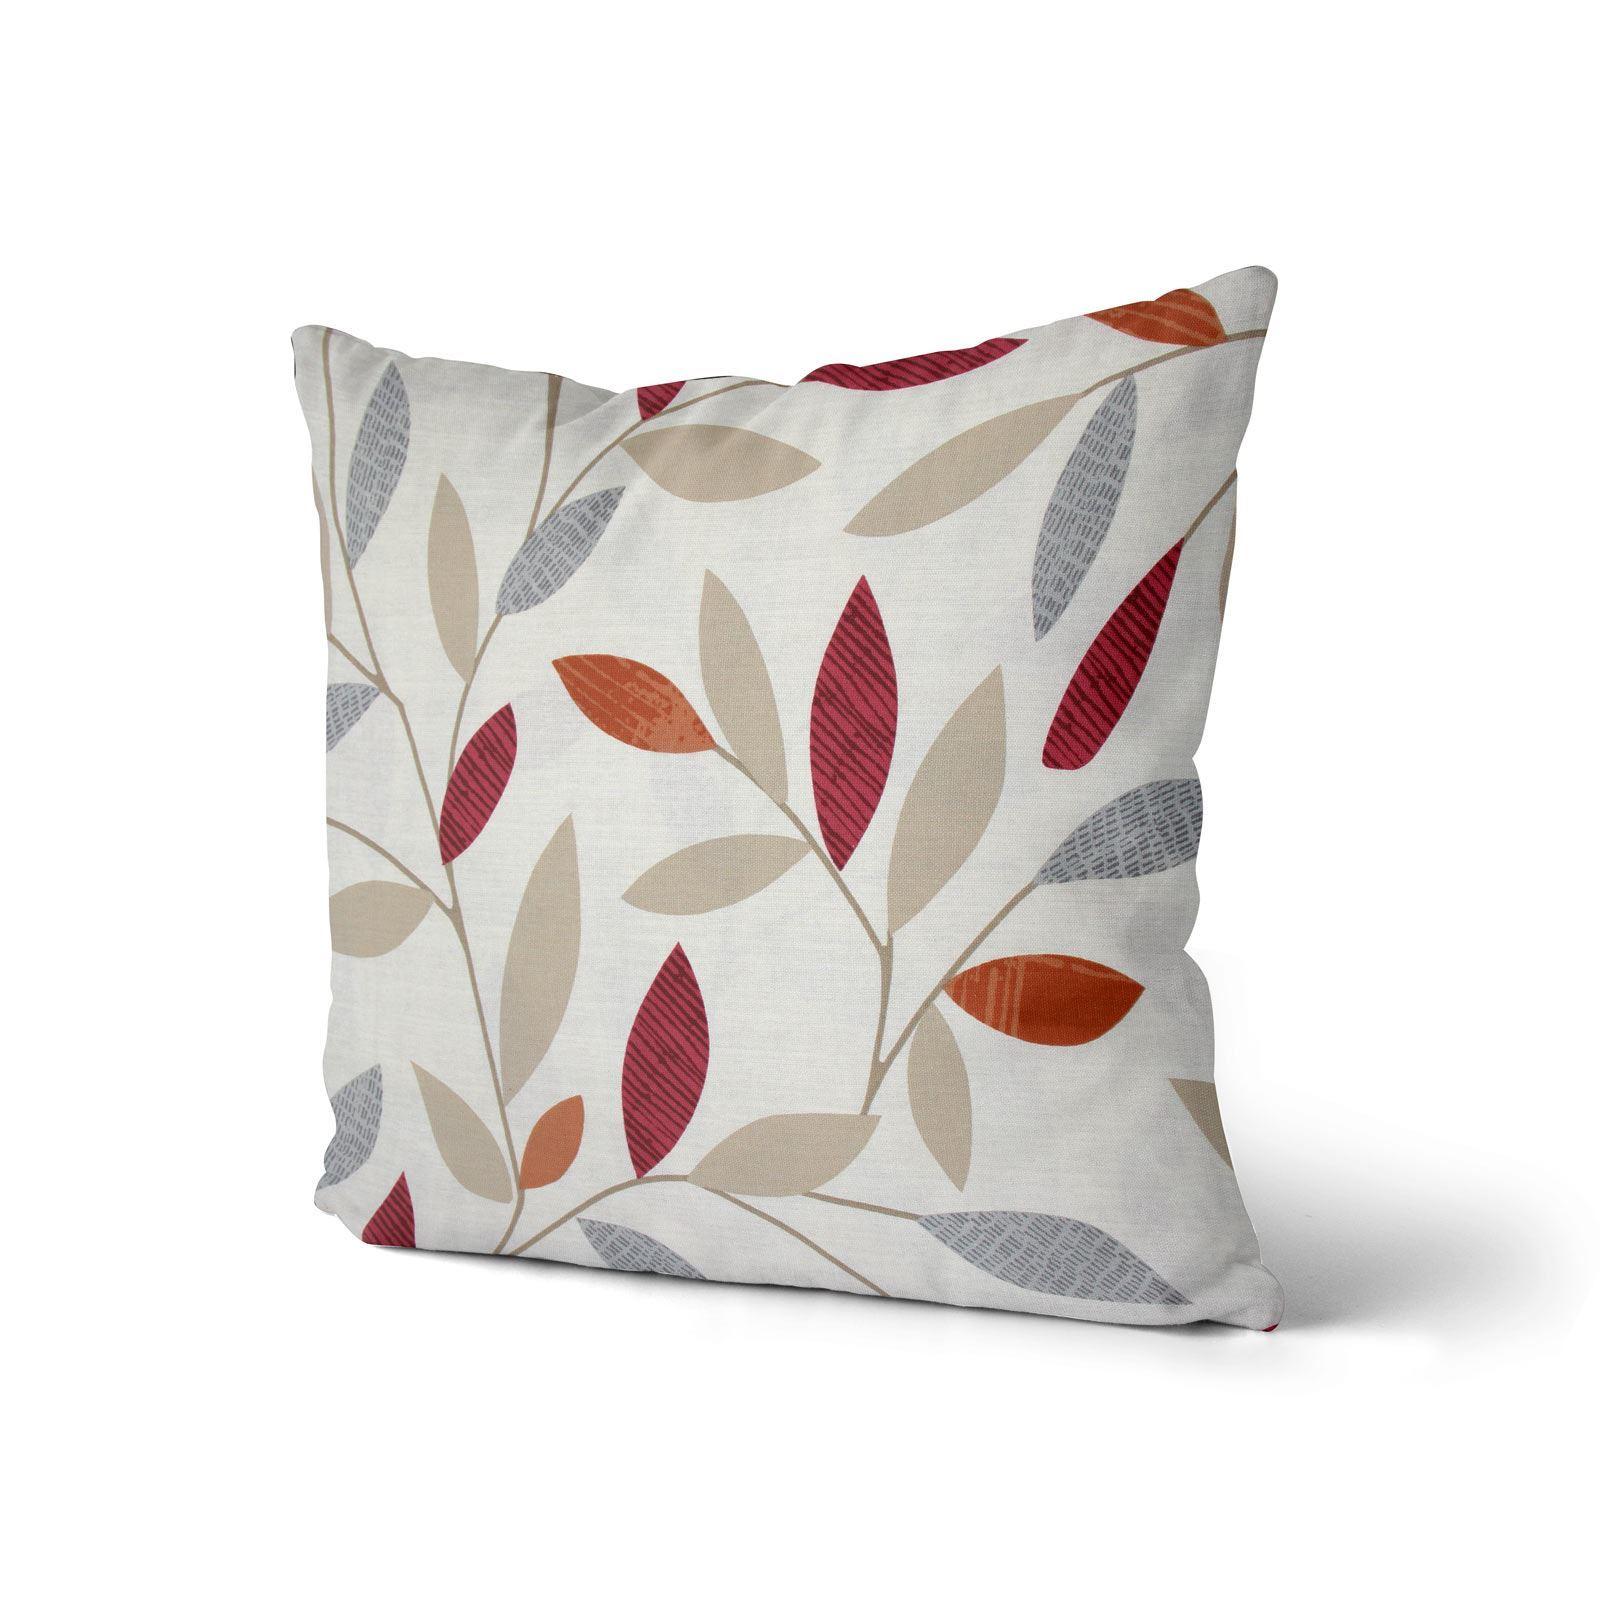 Vino-Tinto-Cushion-Covers-Coleccion-17-034-18-034-43cm-45cm-Cubierta miniatura 46